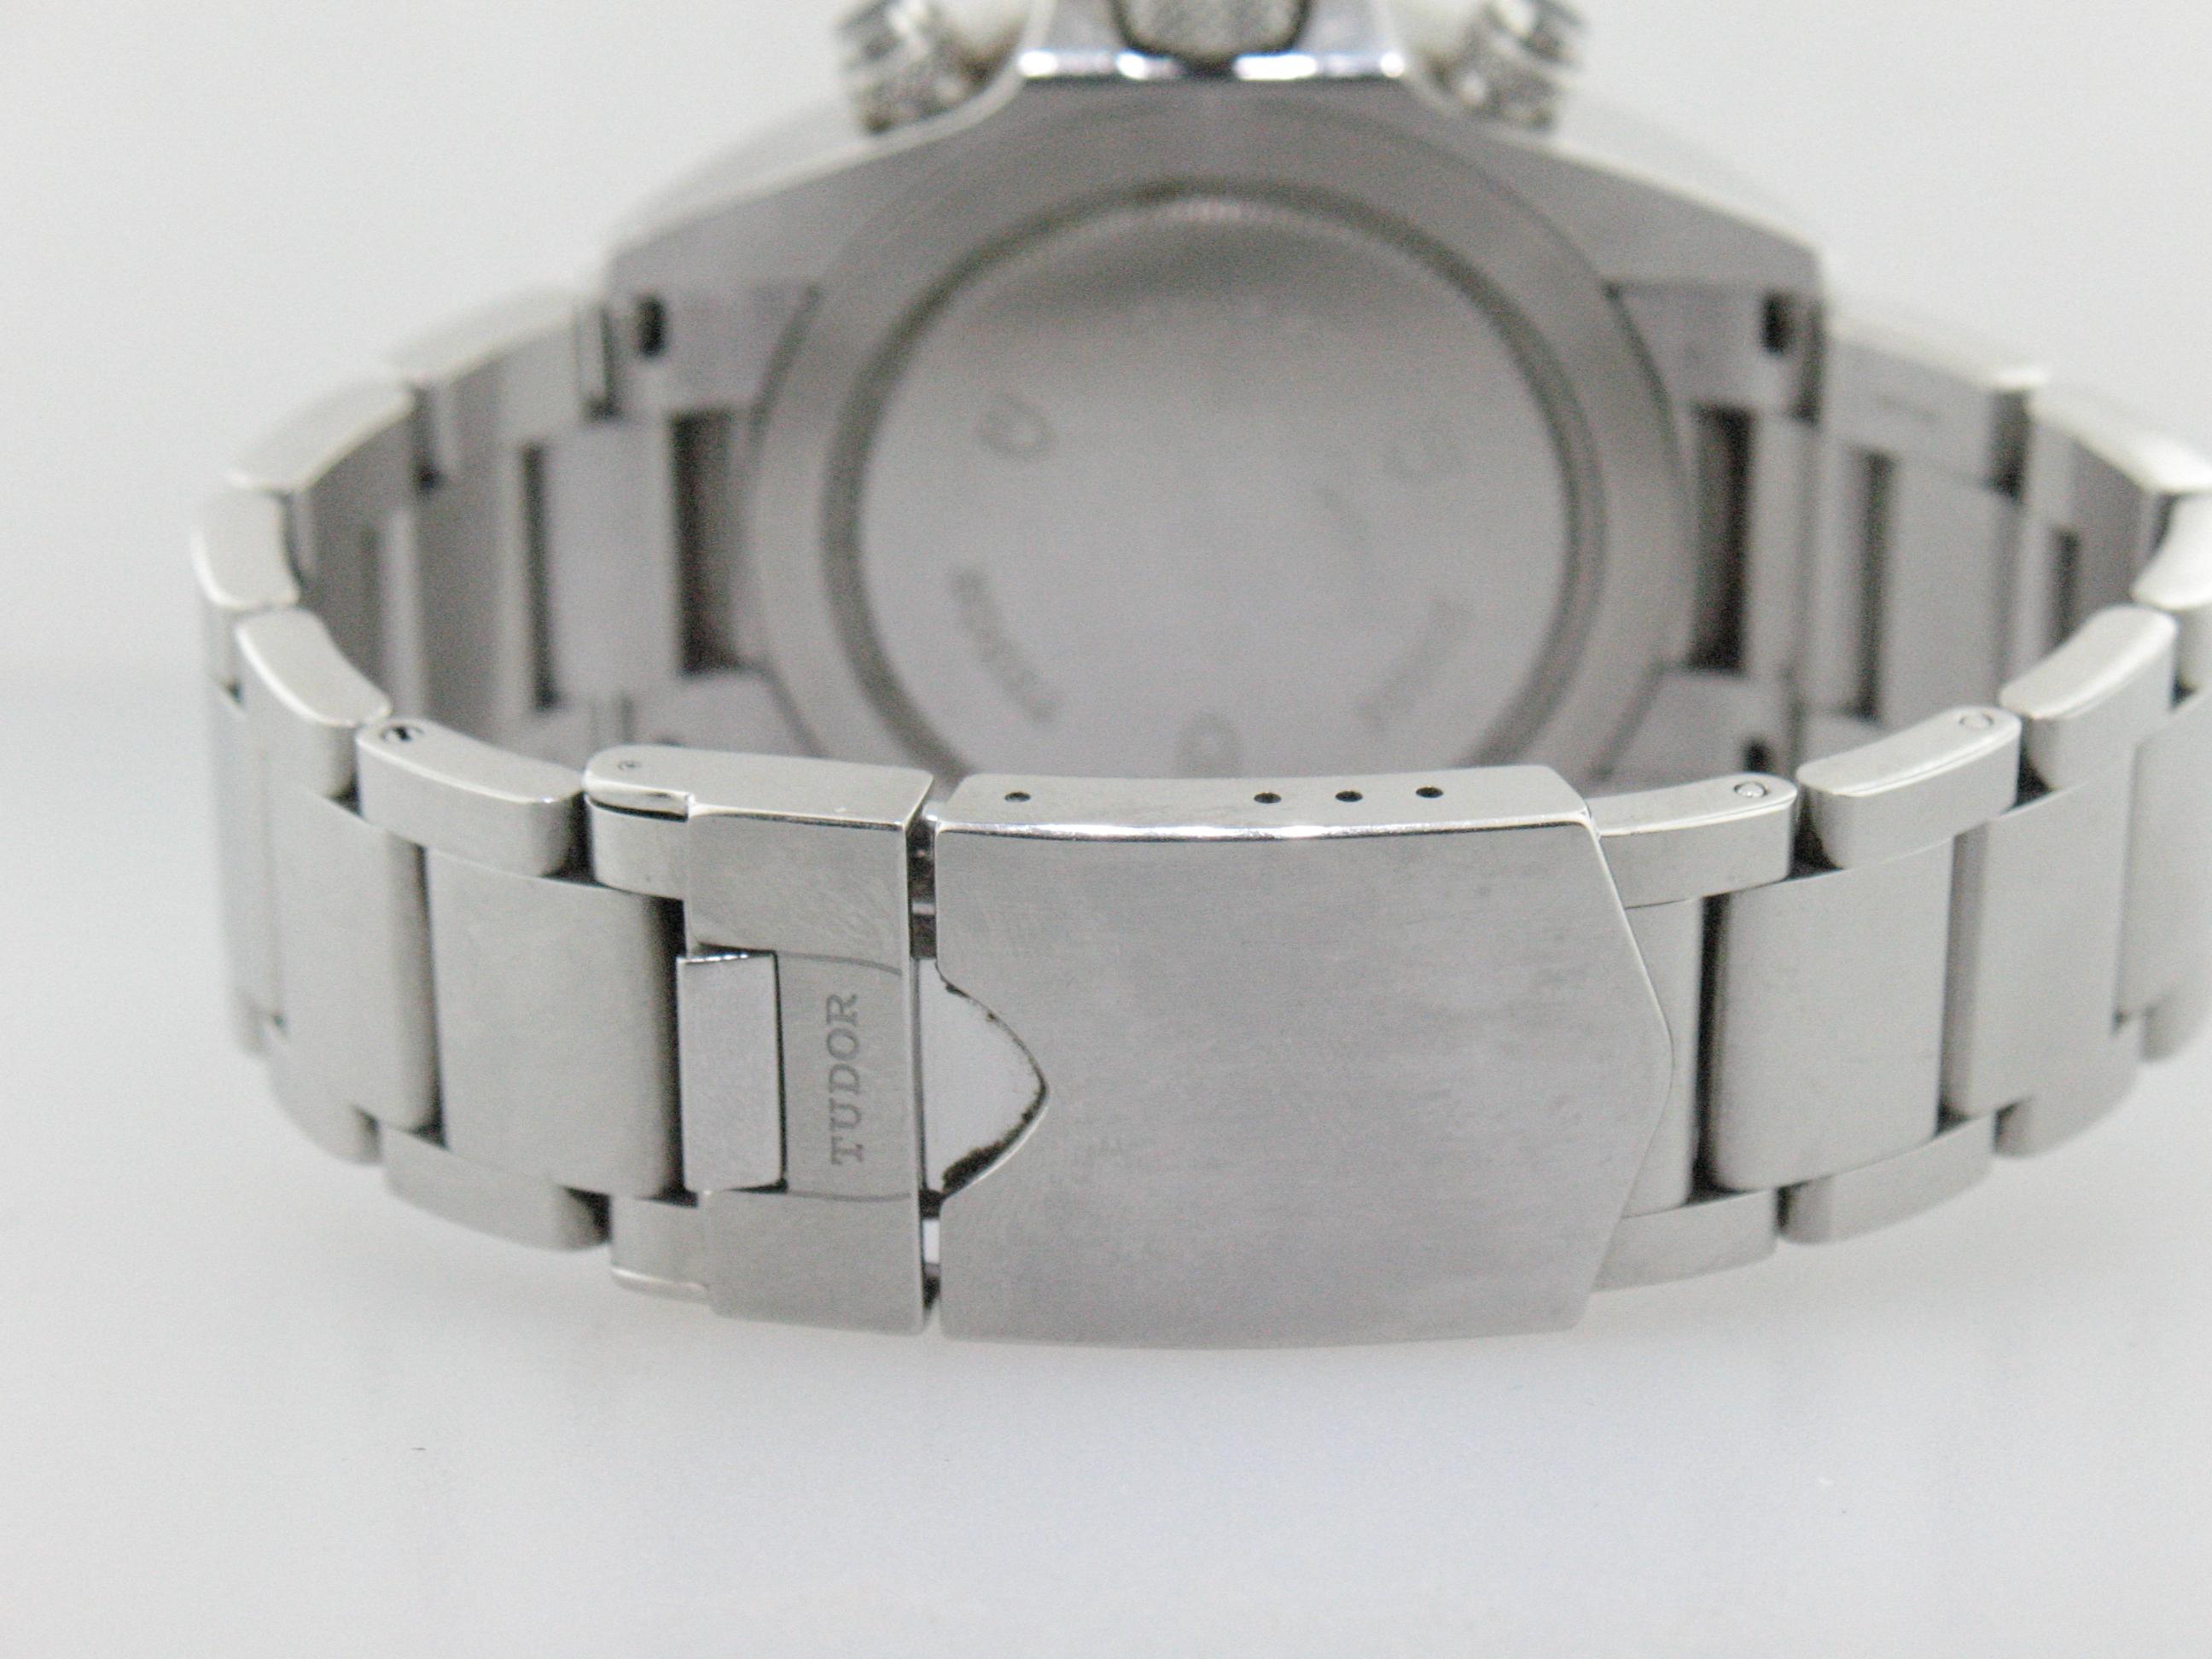 Tudor Heritage Chronograph Stainless Steel 7033ON